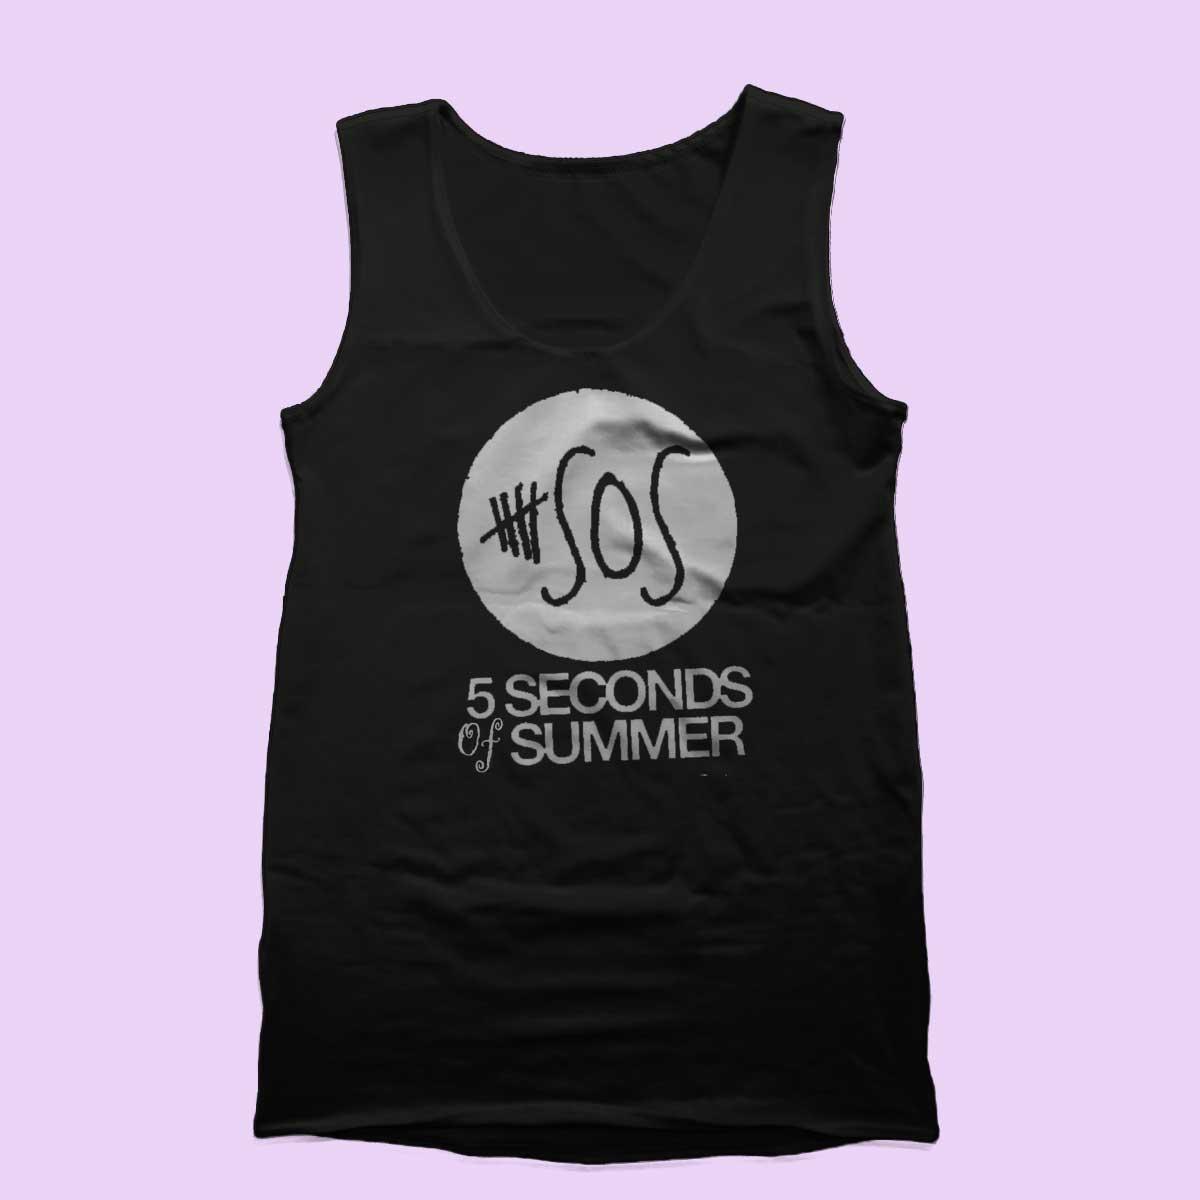 Bravado Juniors 5 Seconds of Summer